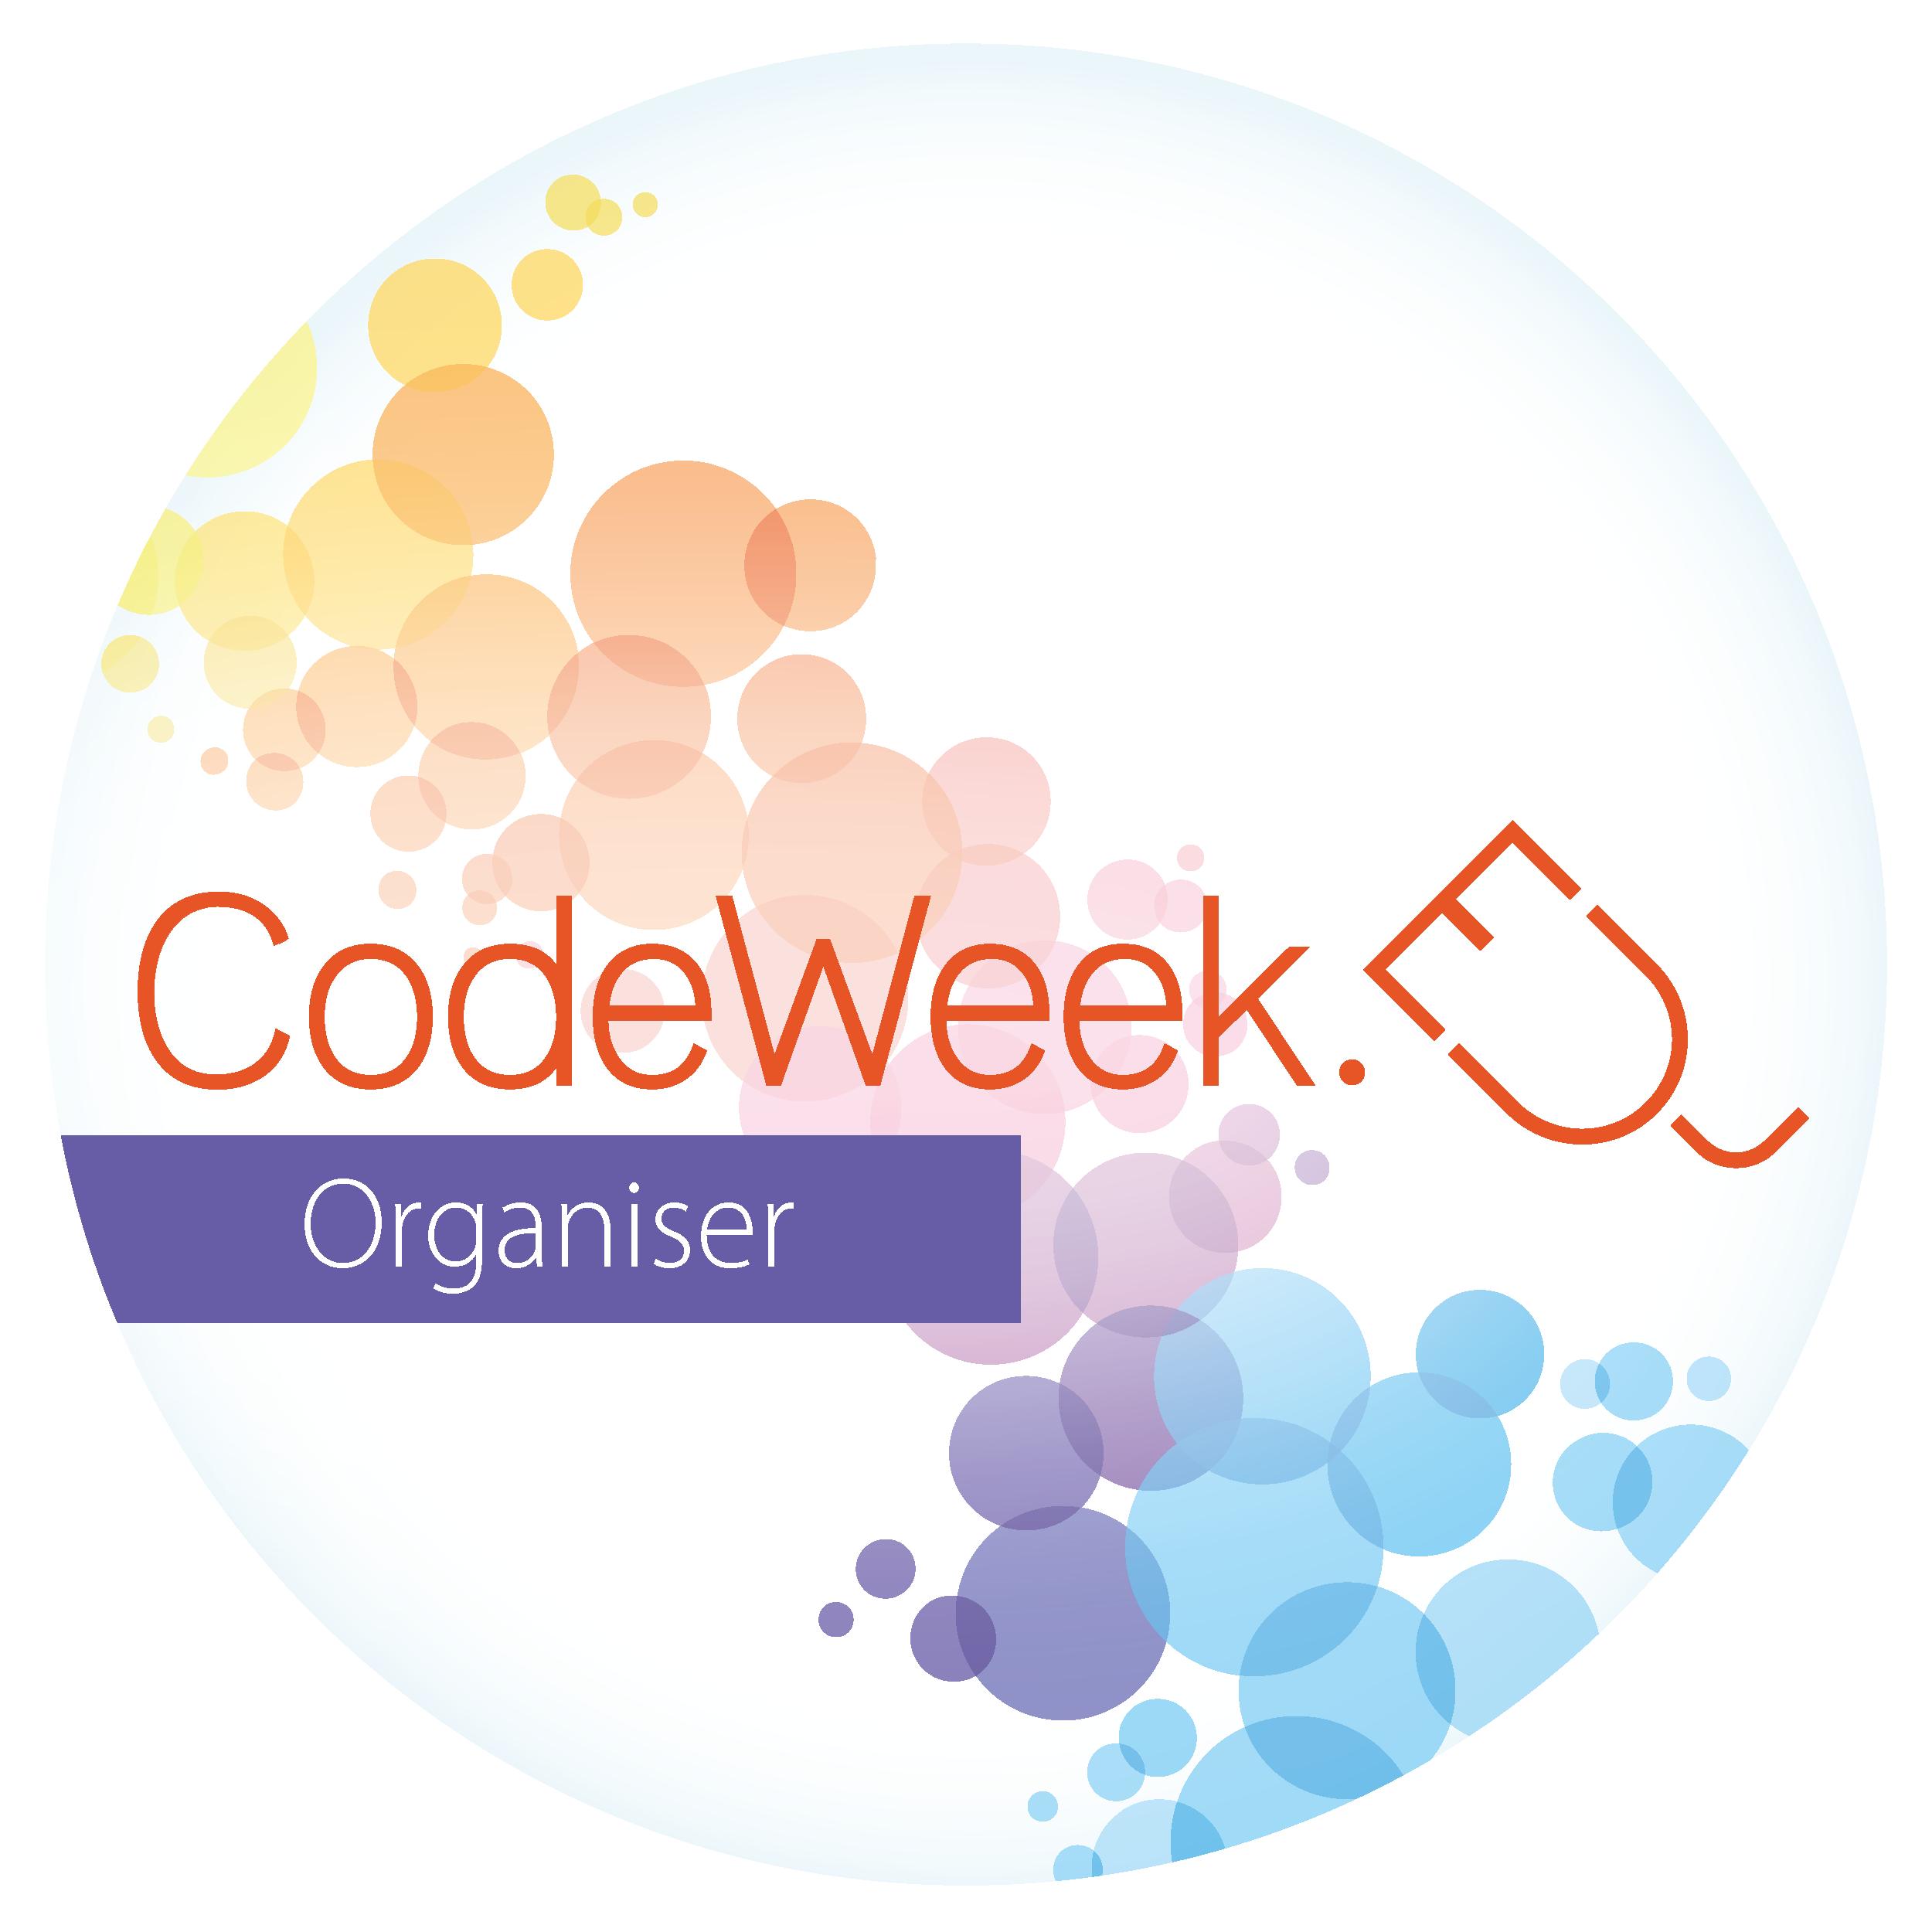 codeweek_logo.png